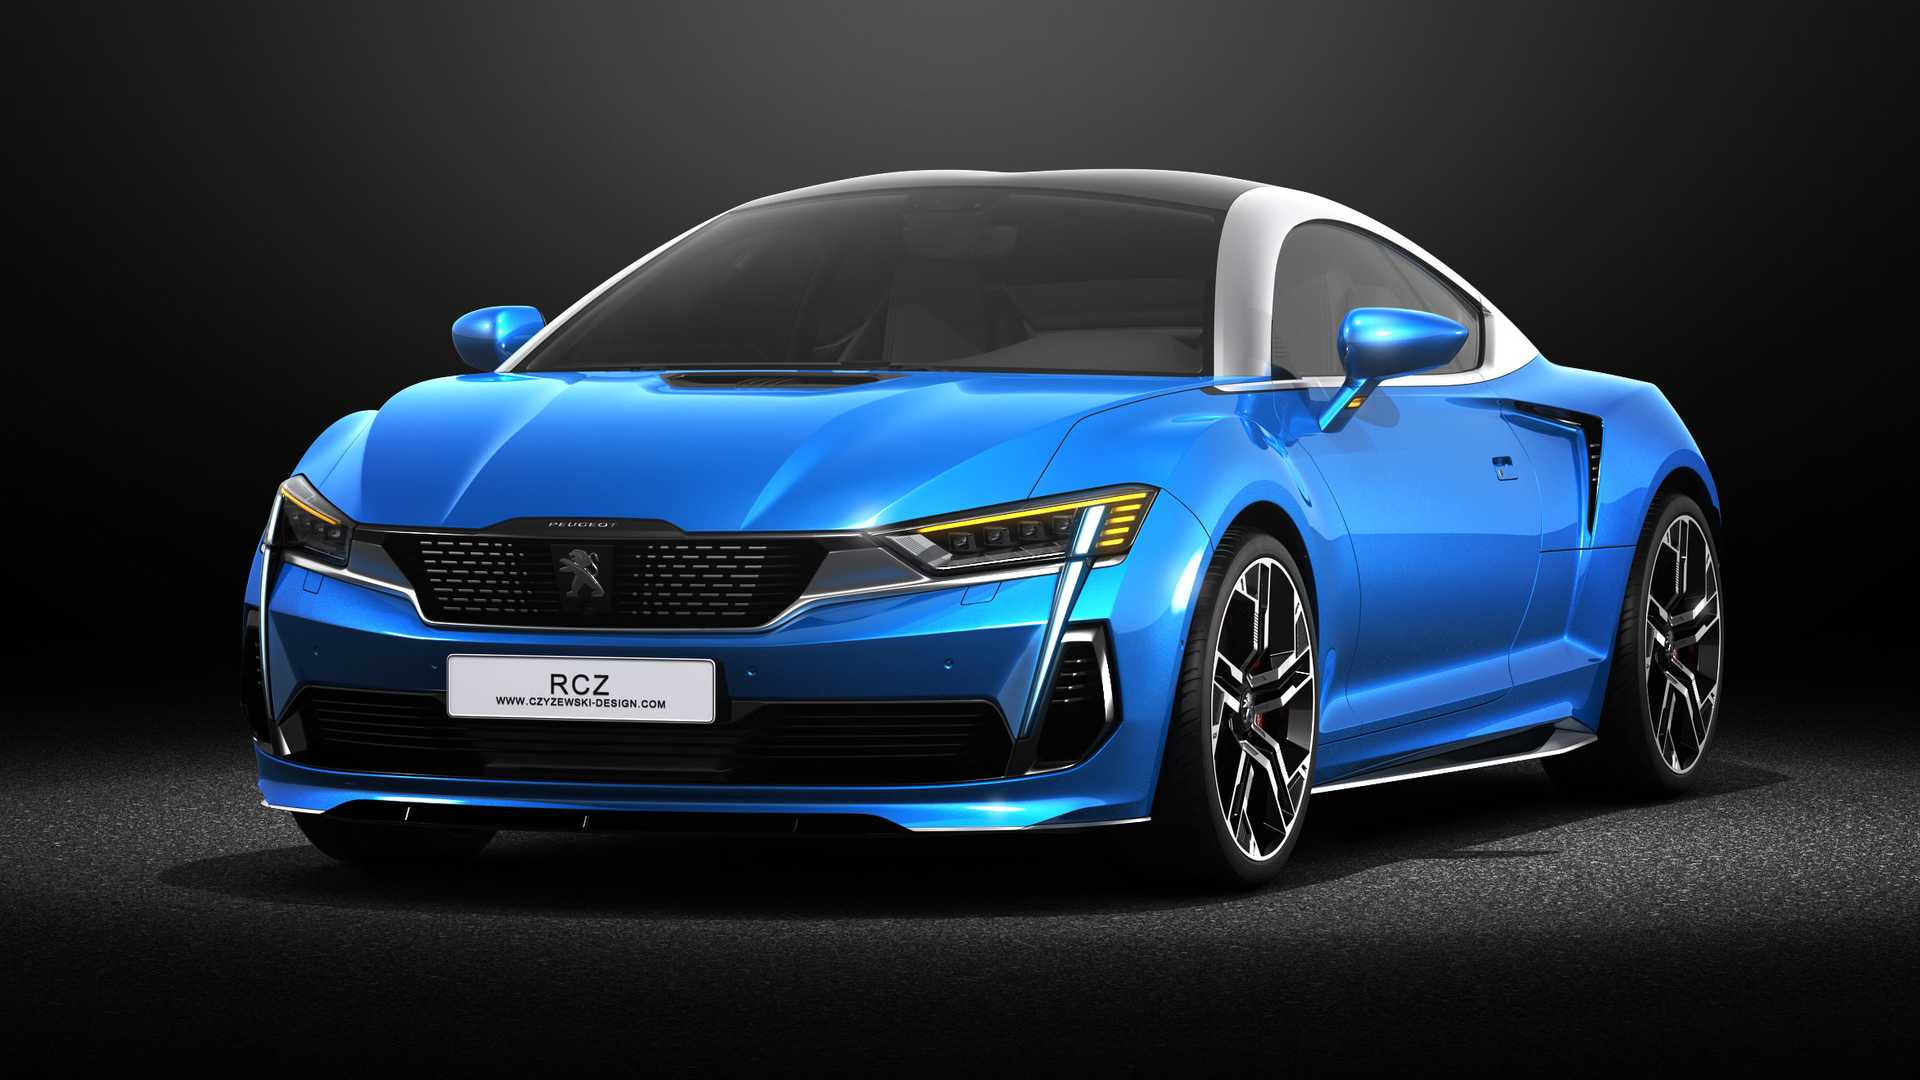 2020_Peugeot_RCZ_rendering_0005